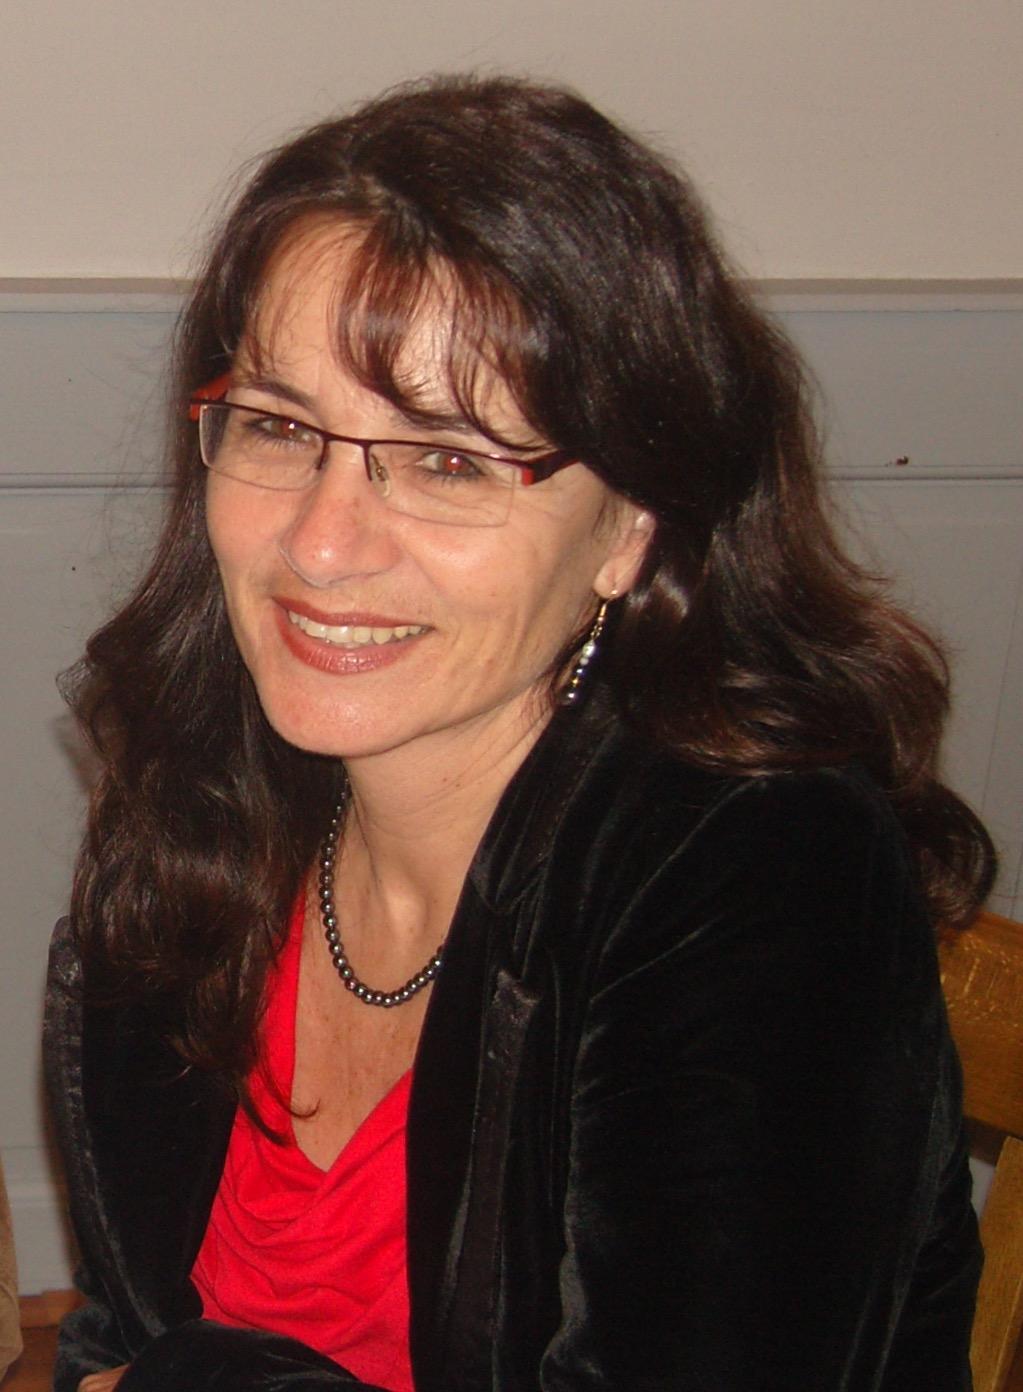 Ruth Schmid